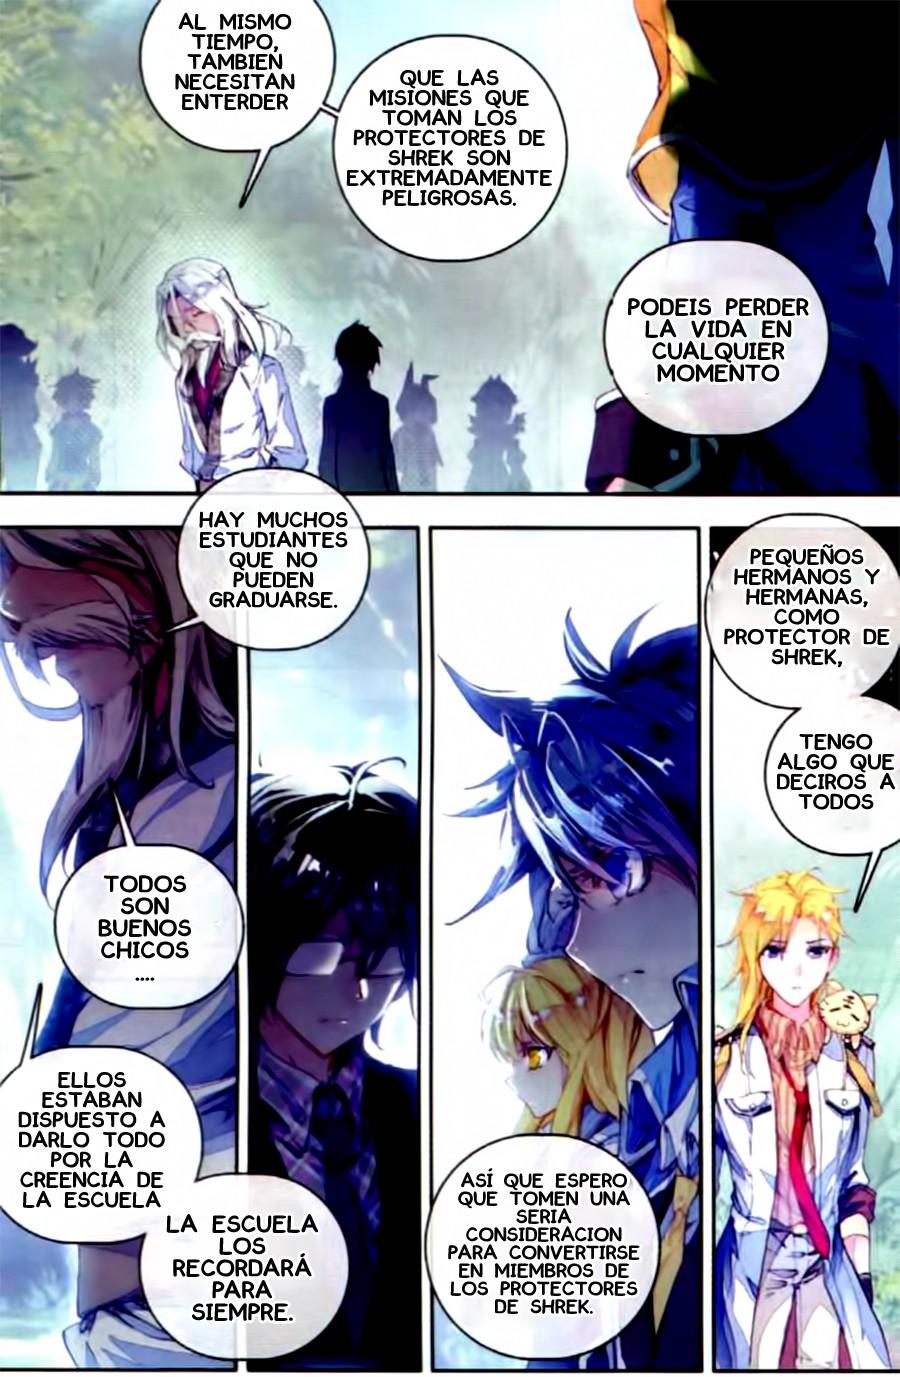 http://c5.ninemanga.com/es_manga/33/16417/435105/bd9b0b4fe7c7d2f2c932c8d279ddb529.jpg Page 10